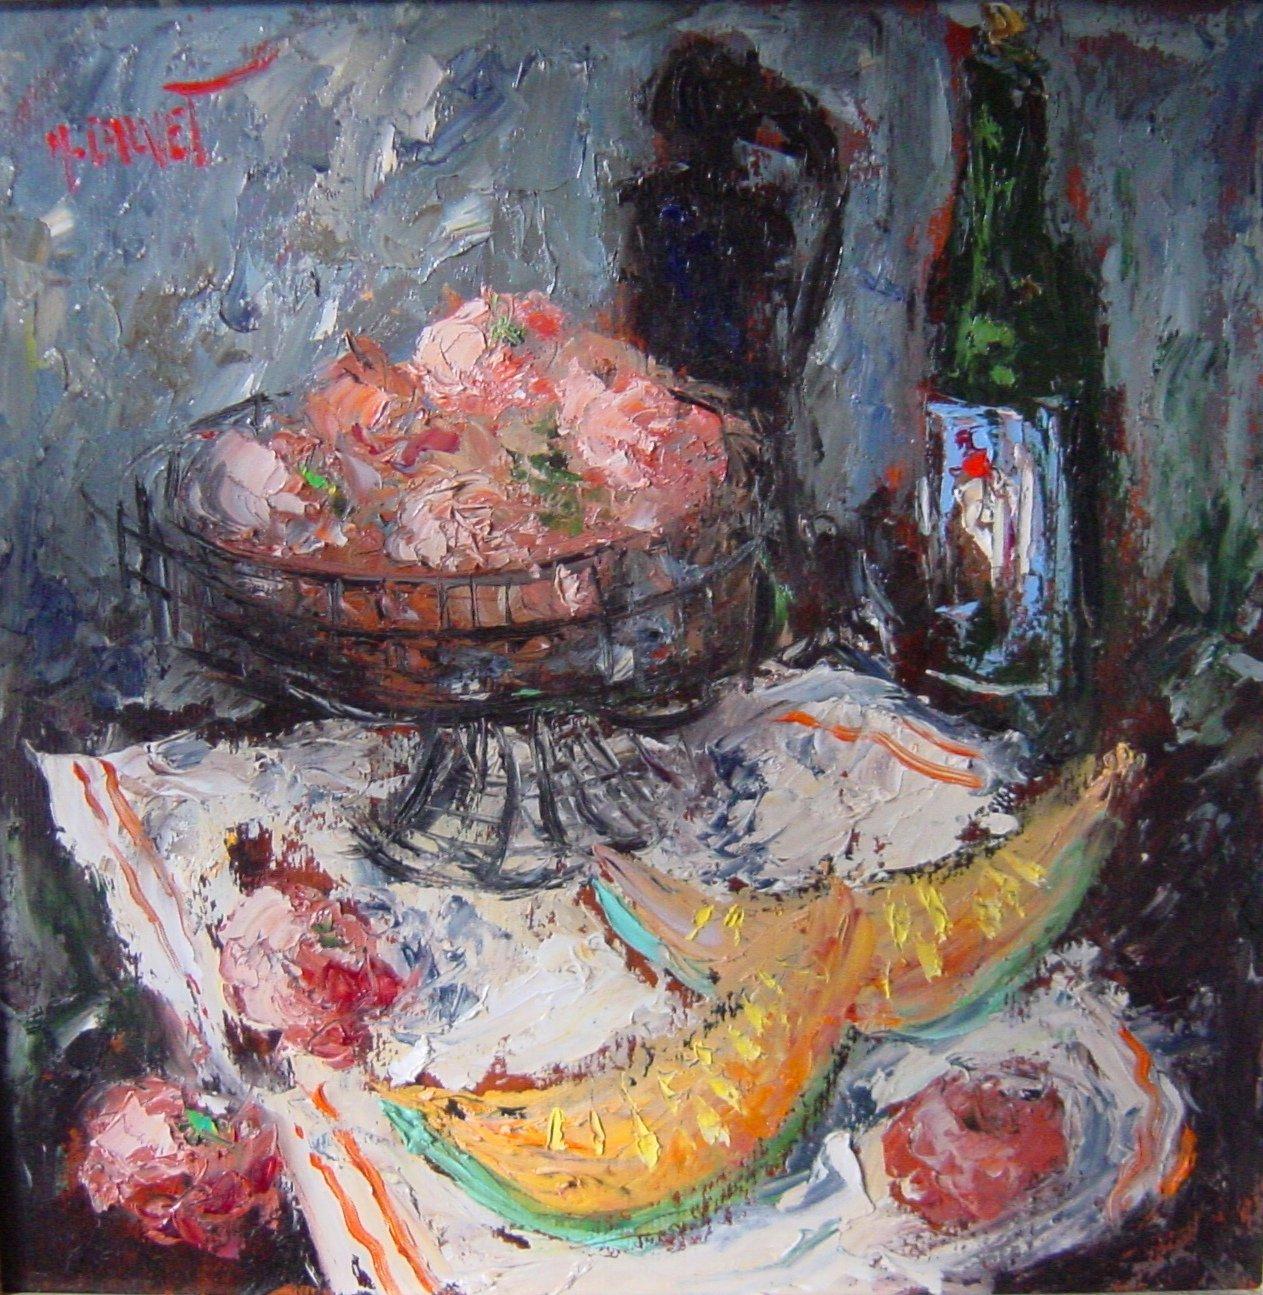 Michel Calvet / Stillleben / Öl auf Holz / 50 x 50 cm / o.J.